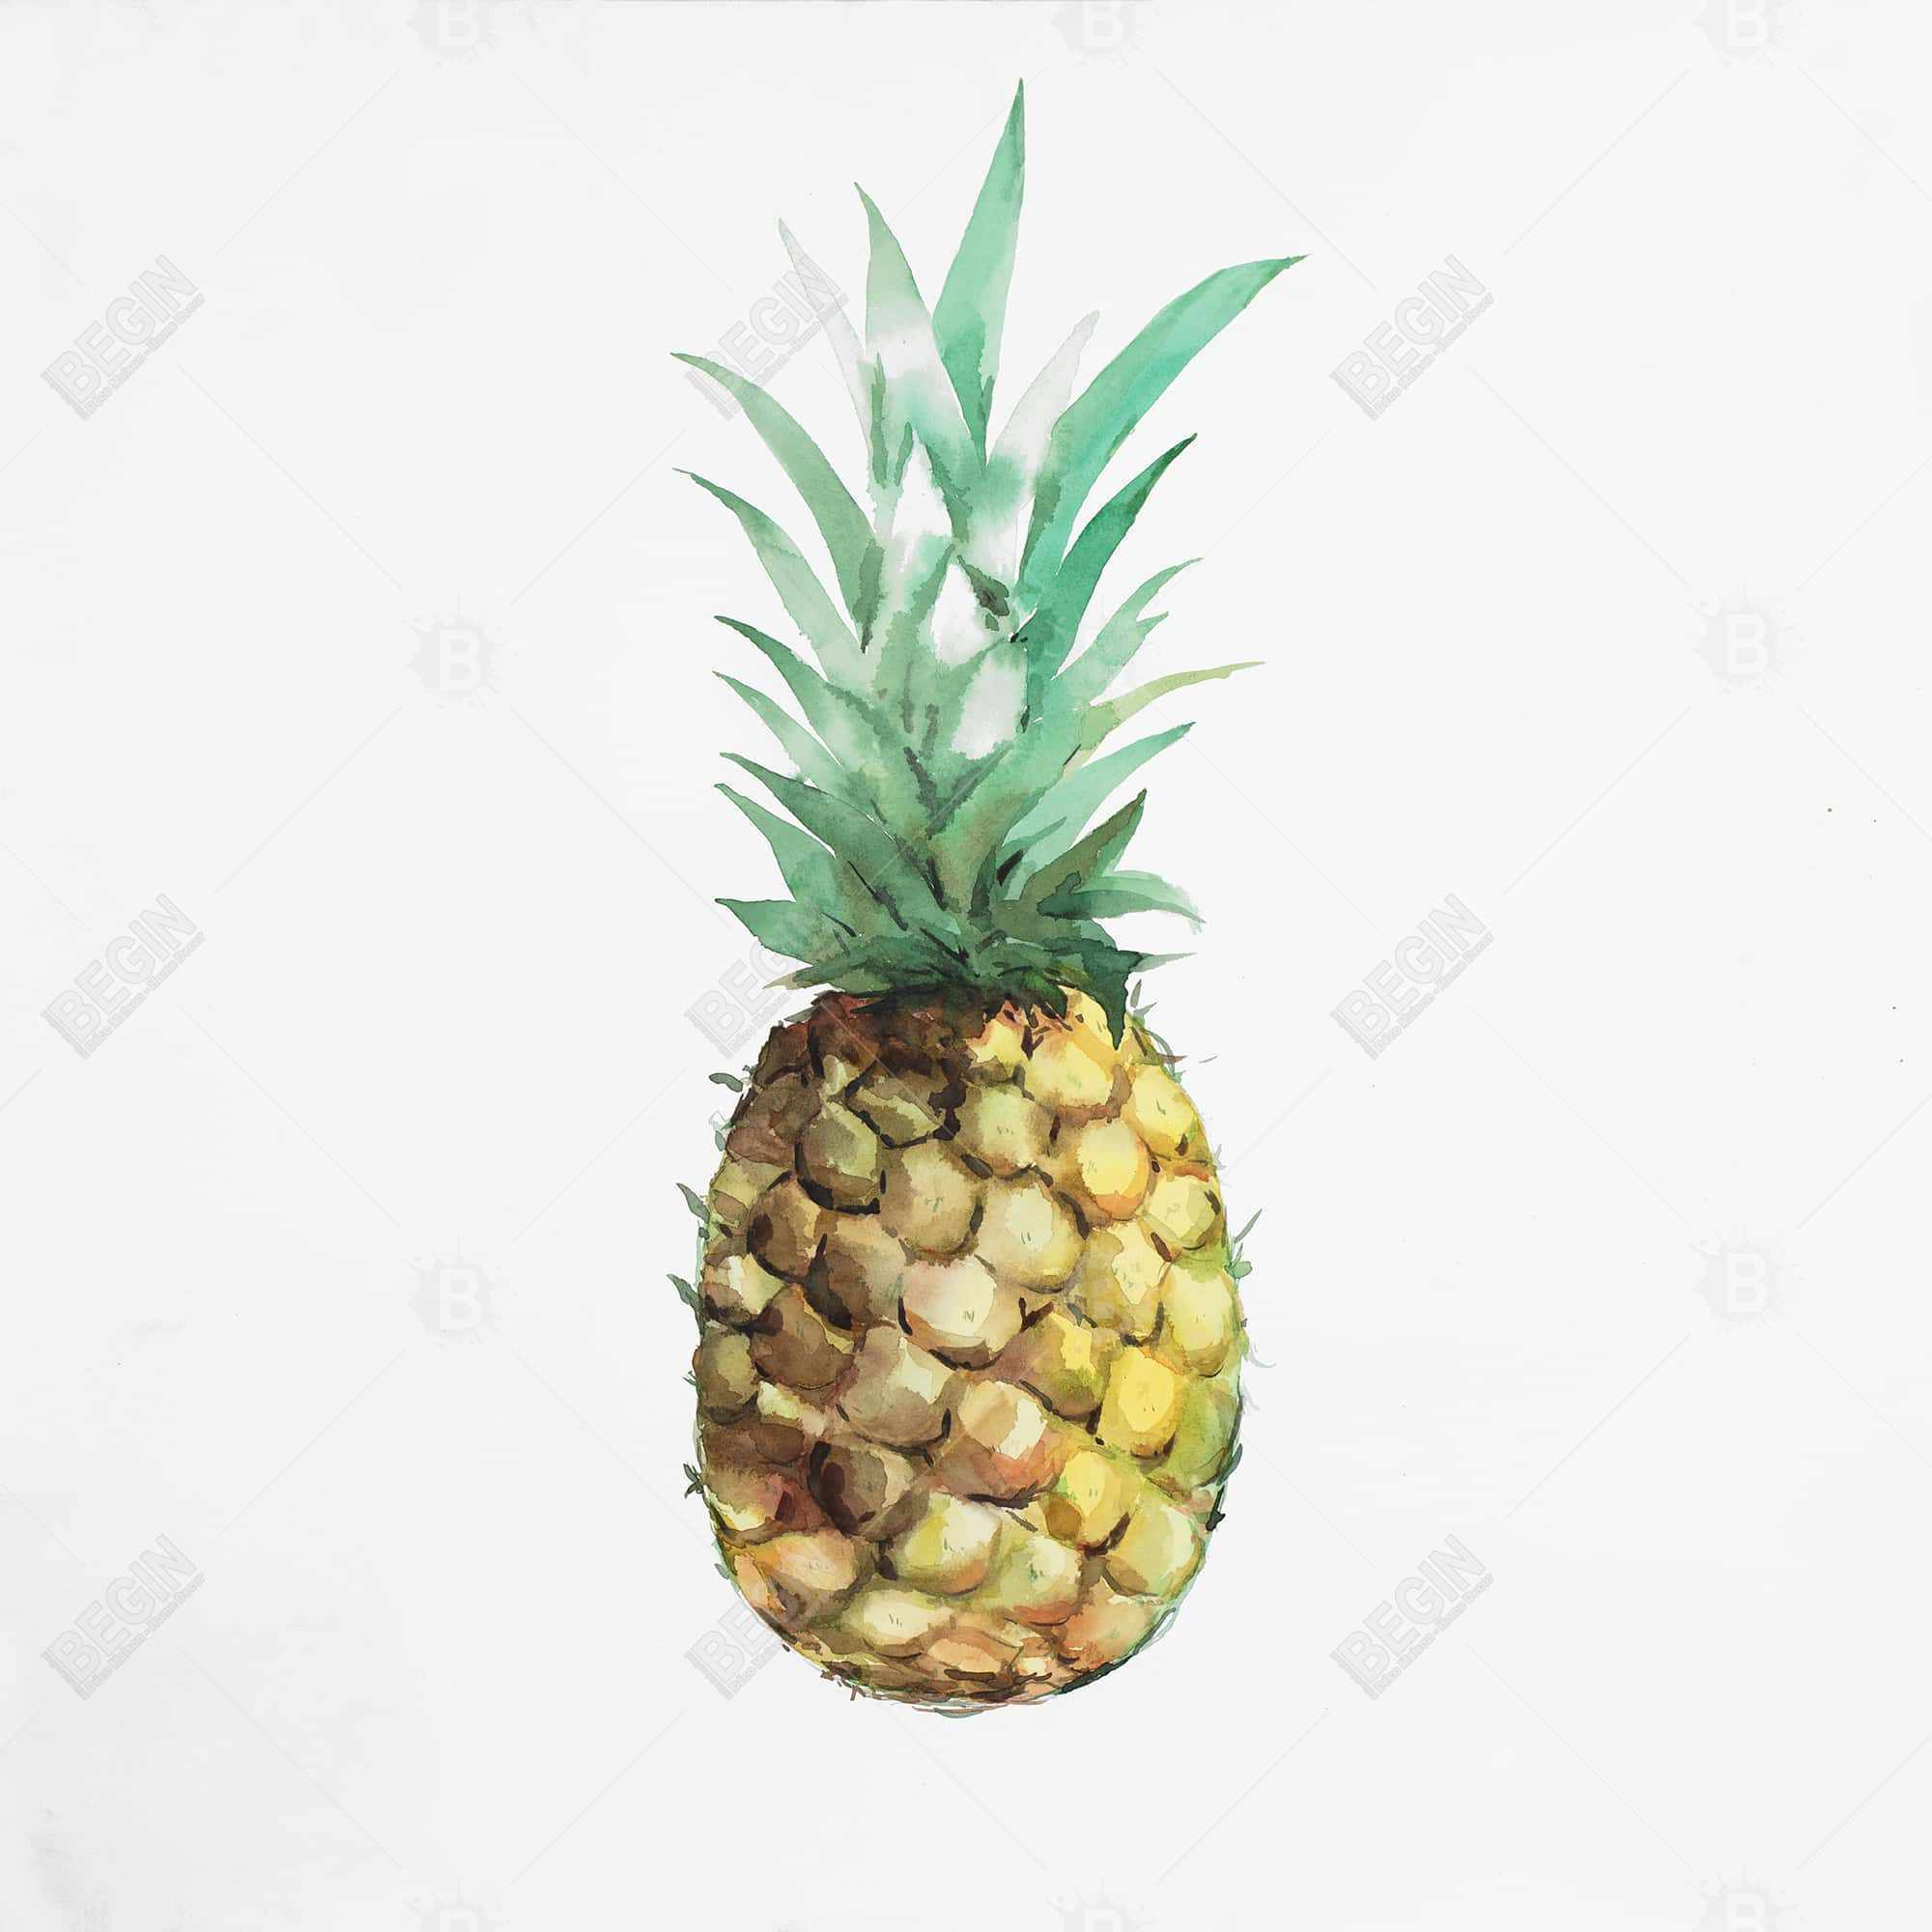 Ananas à l'aquarelle